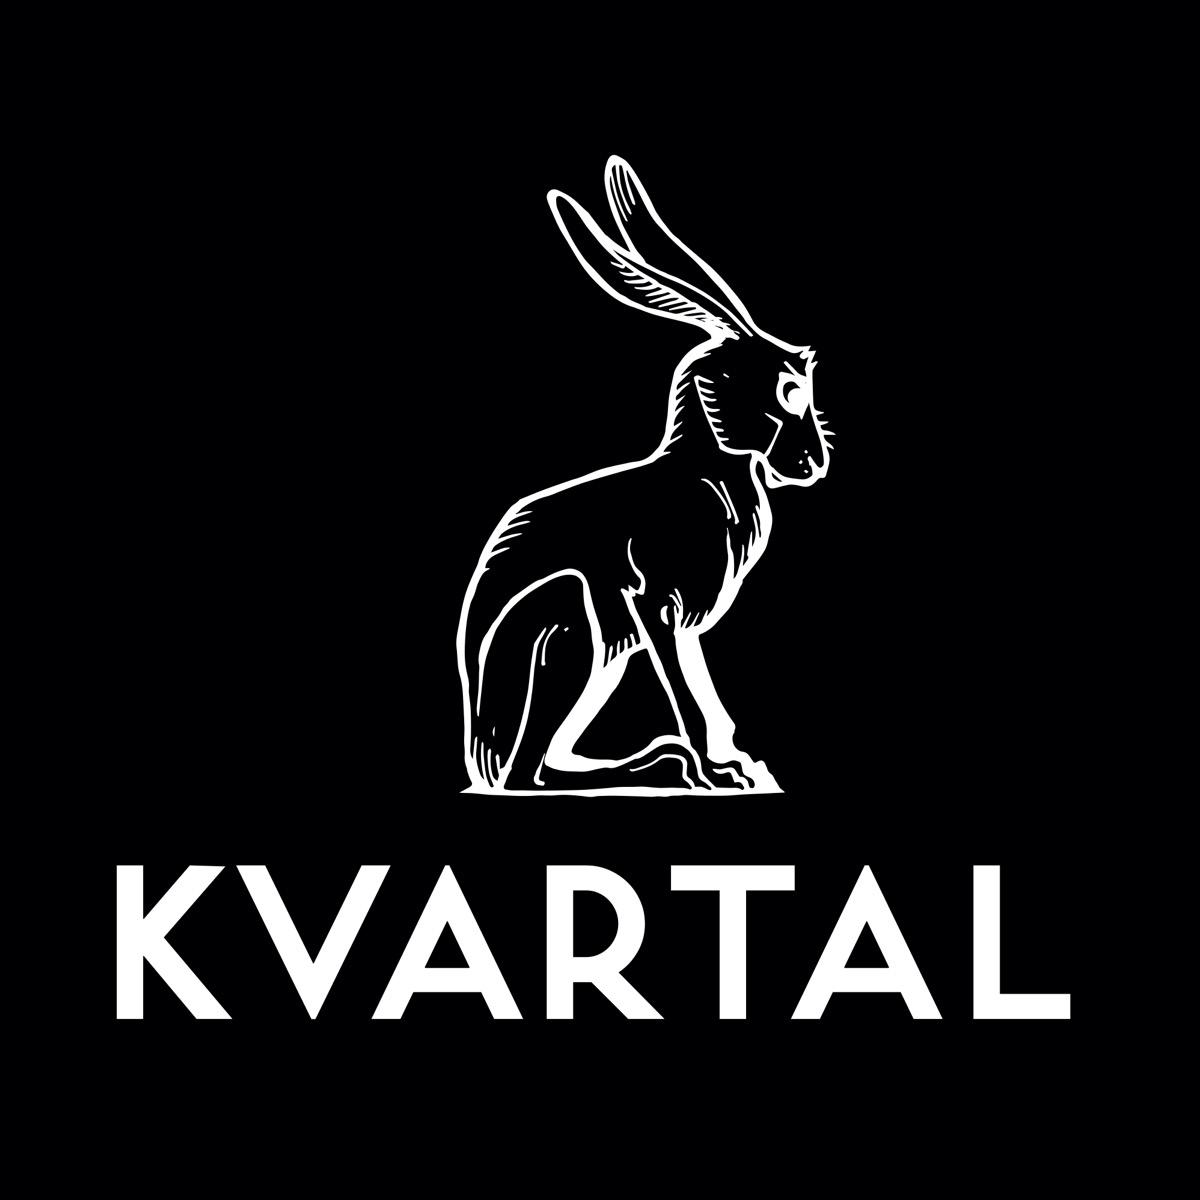 Kvartal - logo